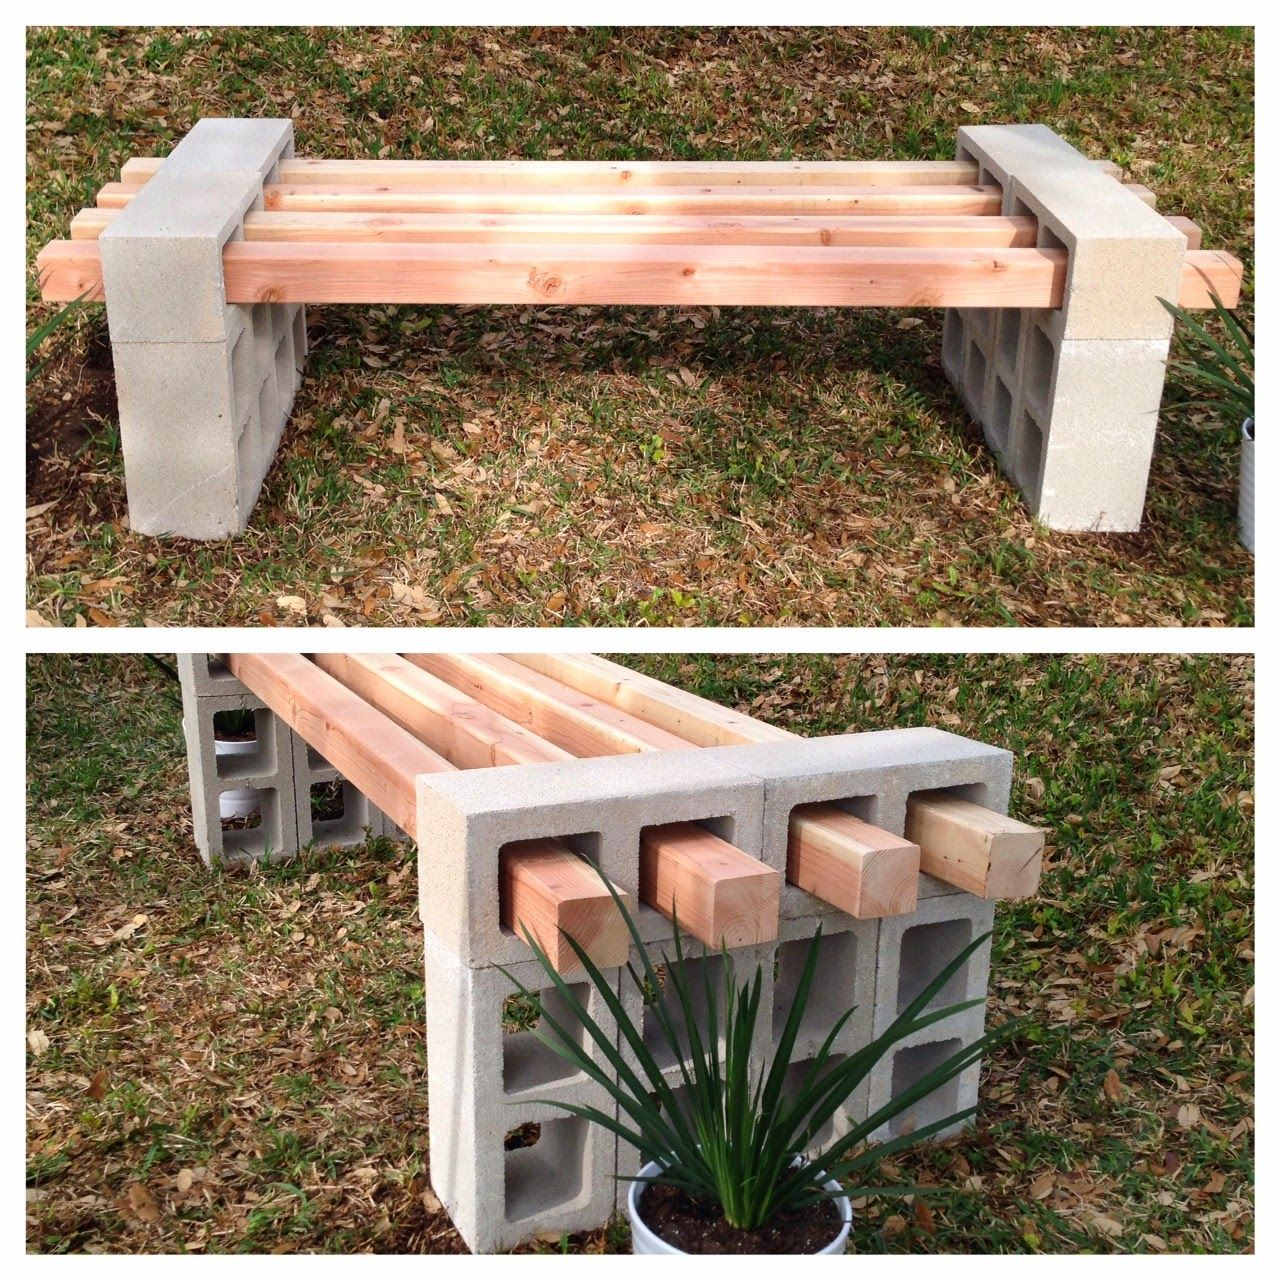 Diy Cinder Block Bench Backyard Furniture Diy Outdoor Diy Garden